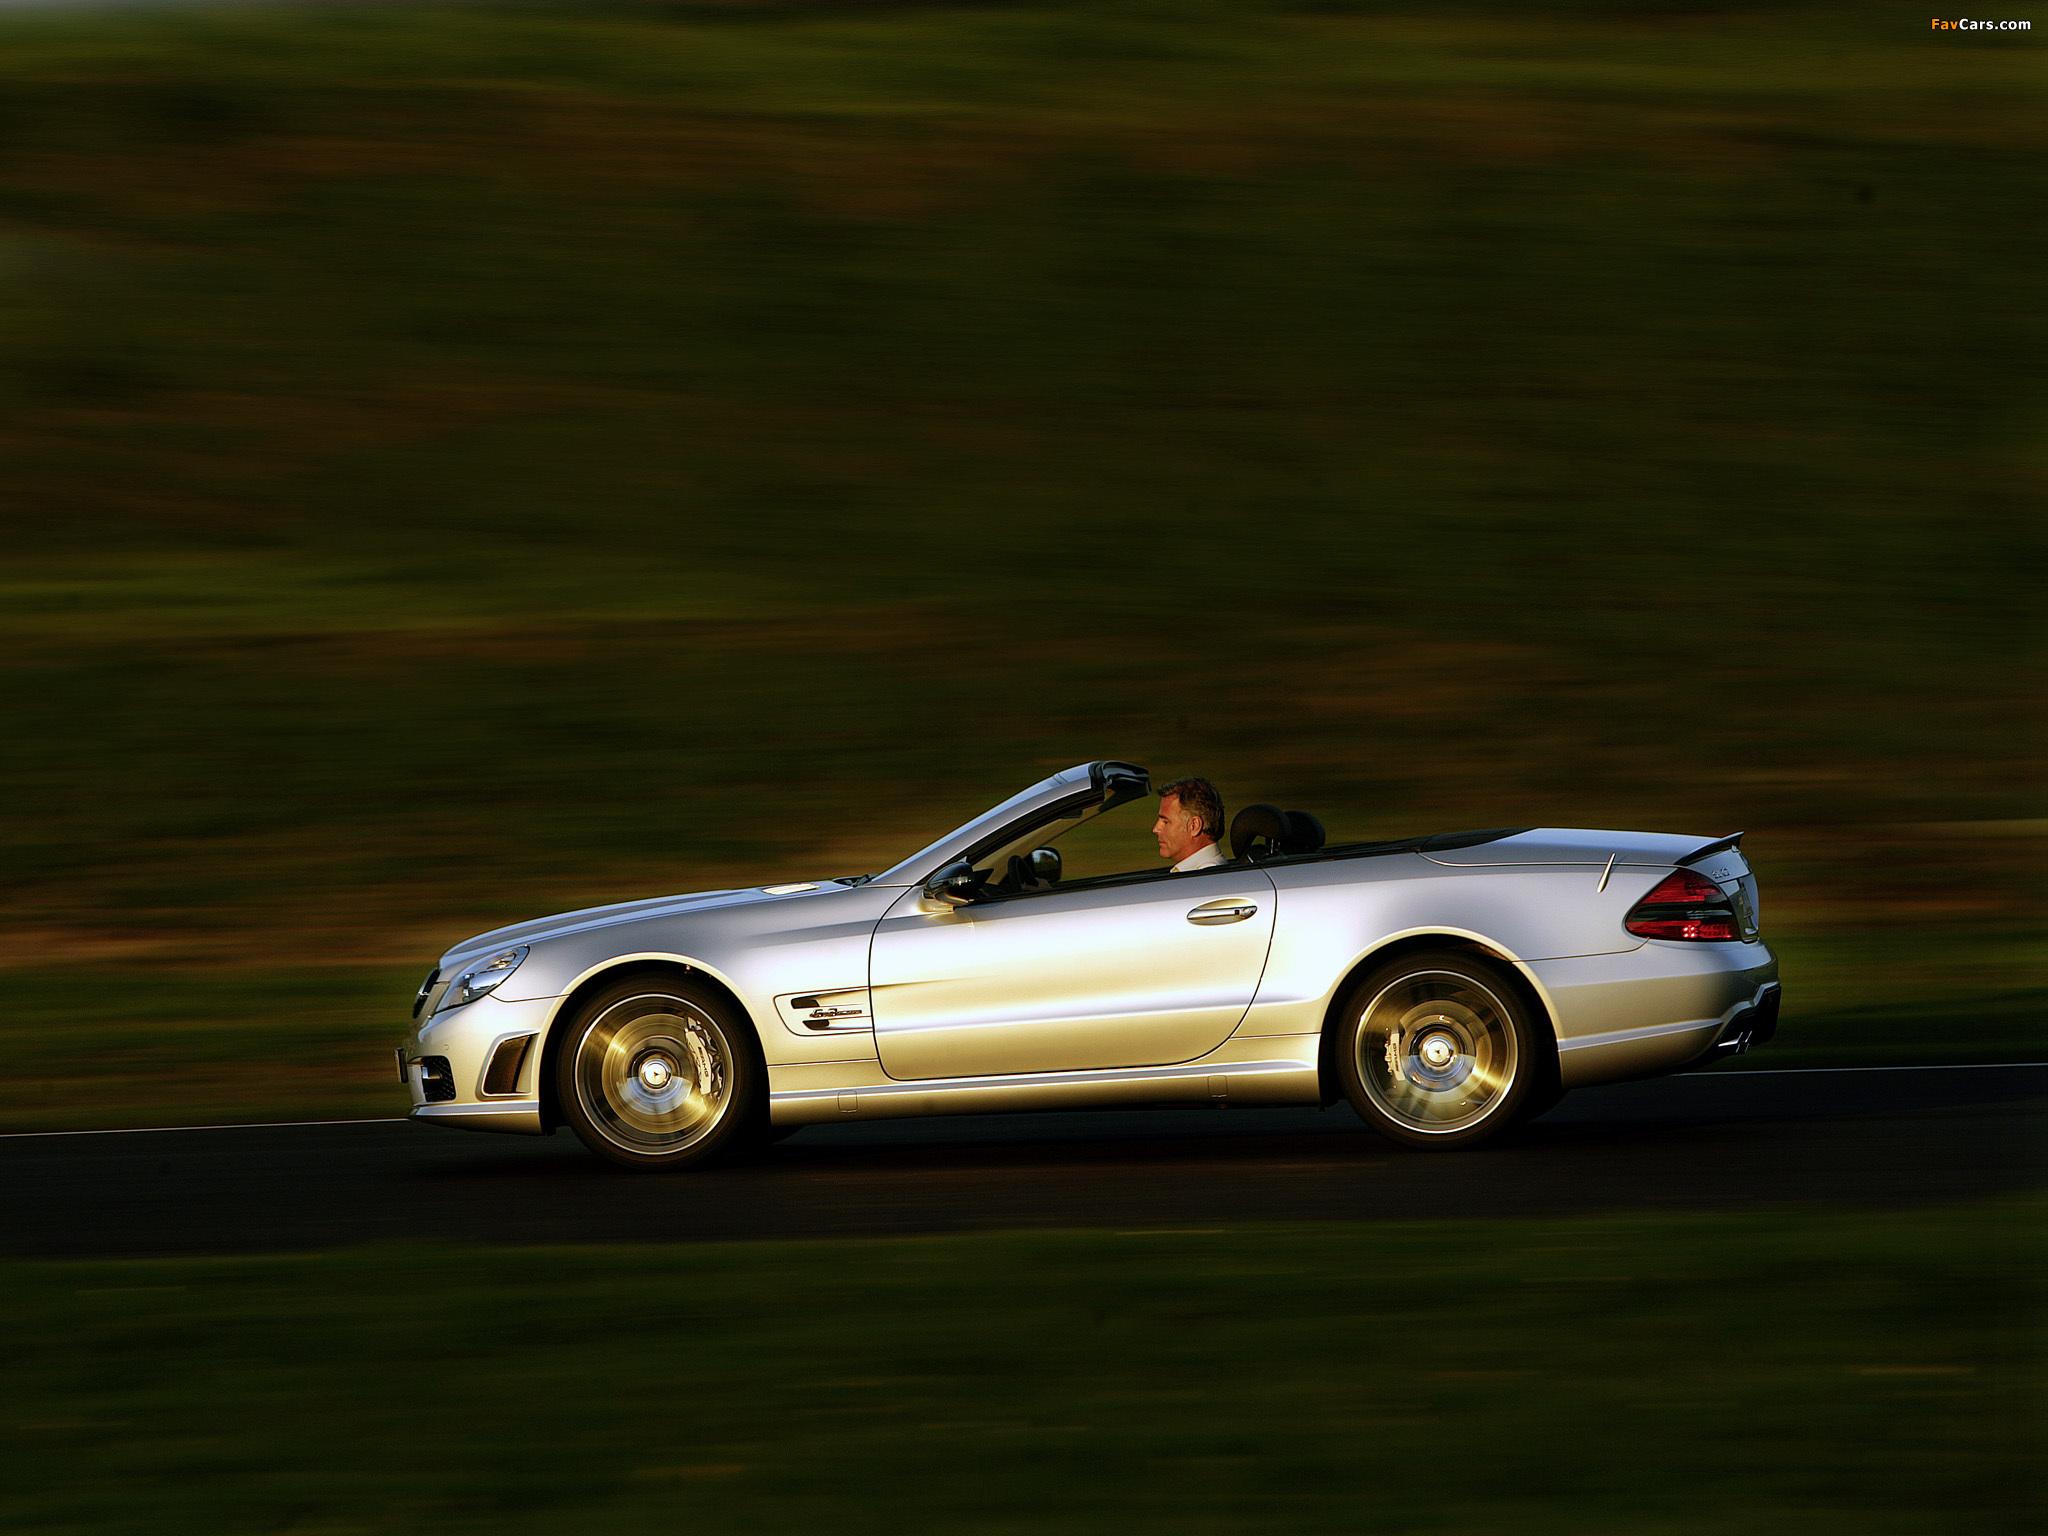 Mercedes benz sl 63 amg r230 2008 11 photos 2048x1536 for Mercedes benz sl 63 amg